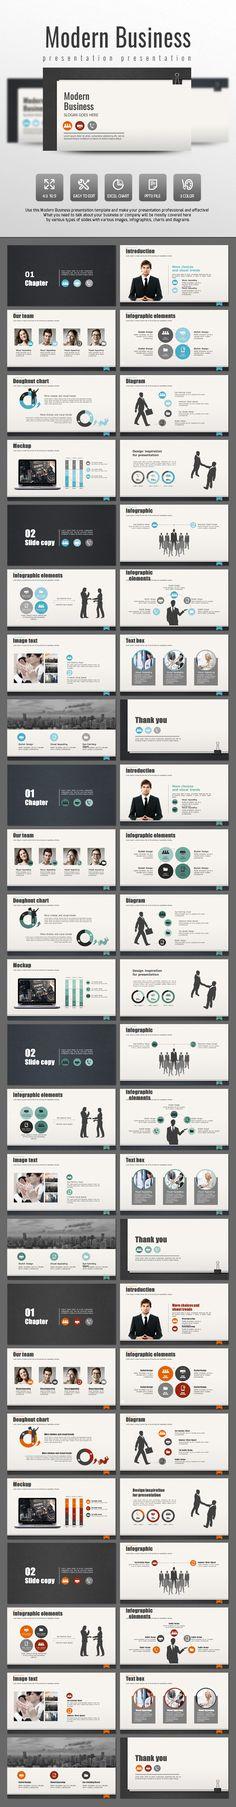 Modern Business PowerPoint Template #design #slides Download: http://graphicriver.net/item/modern-business/14032353?ref=ksioks